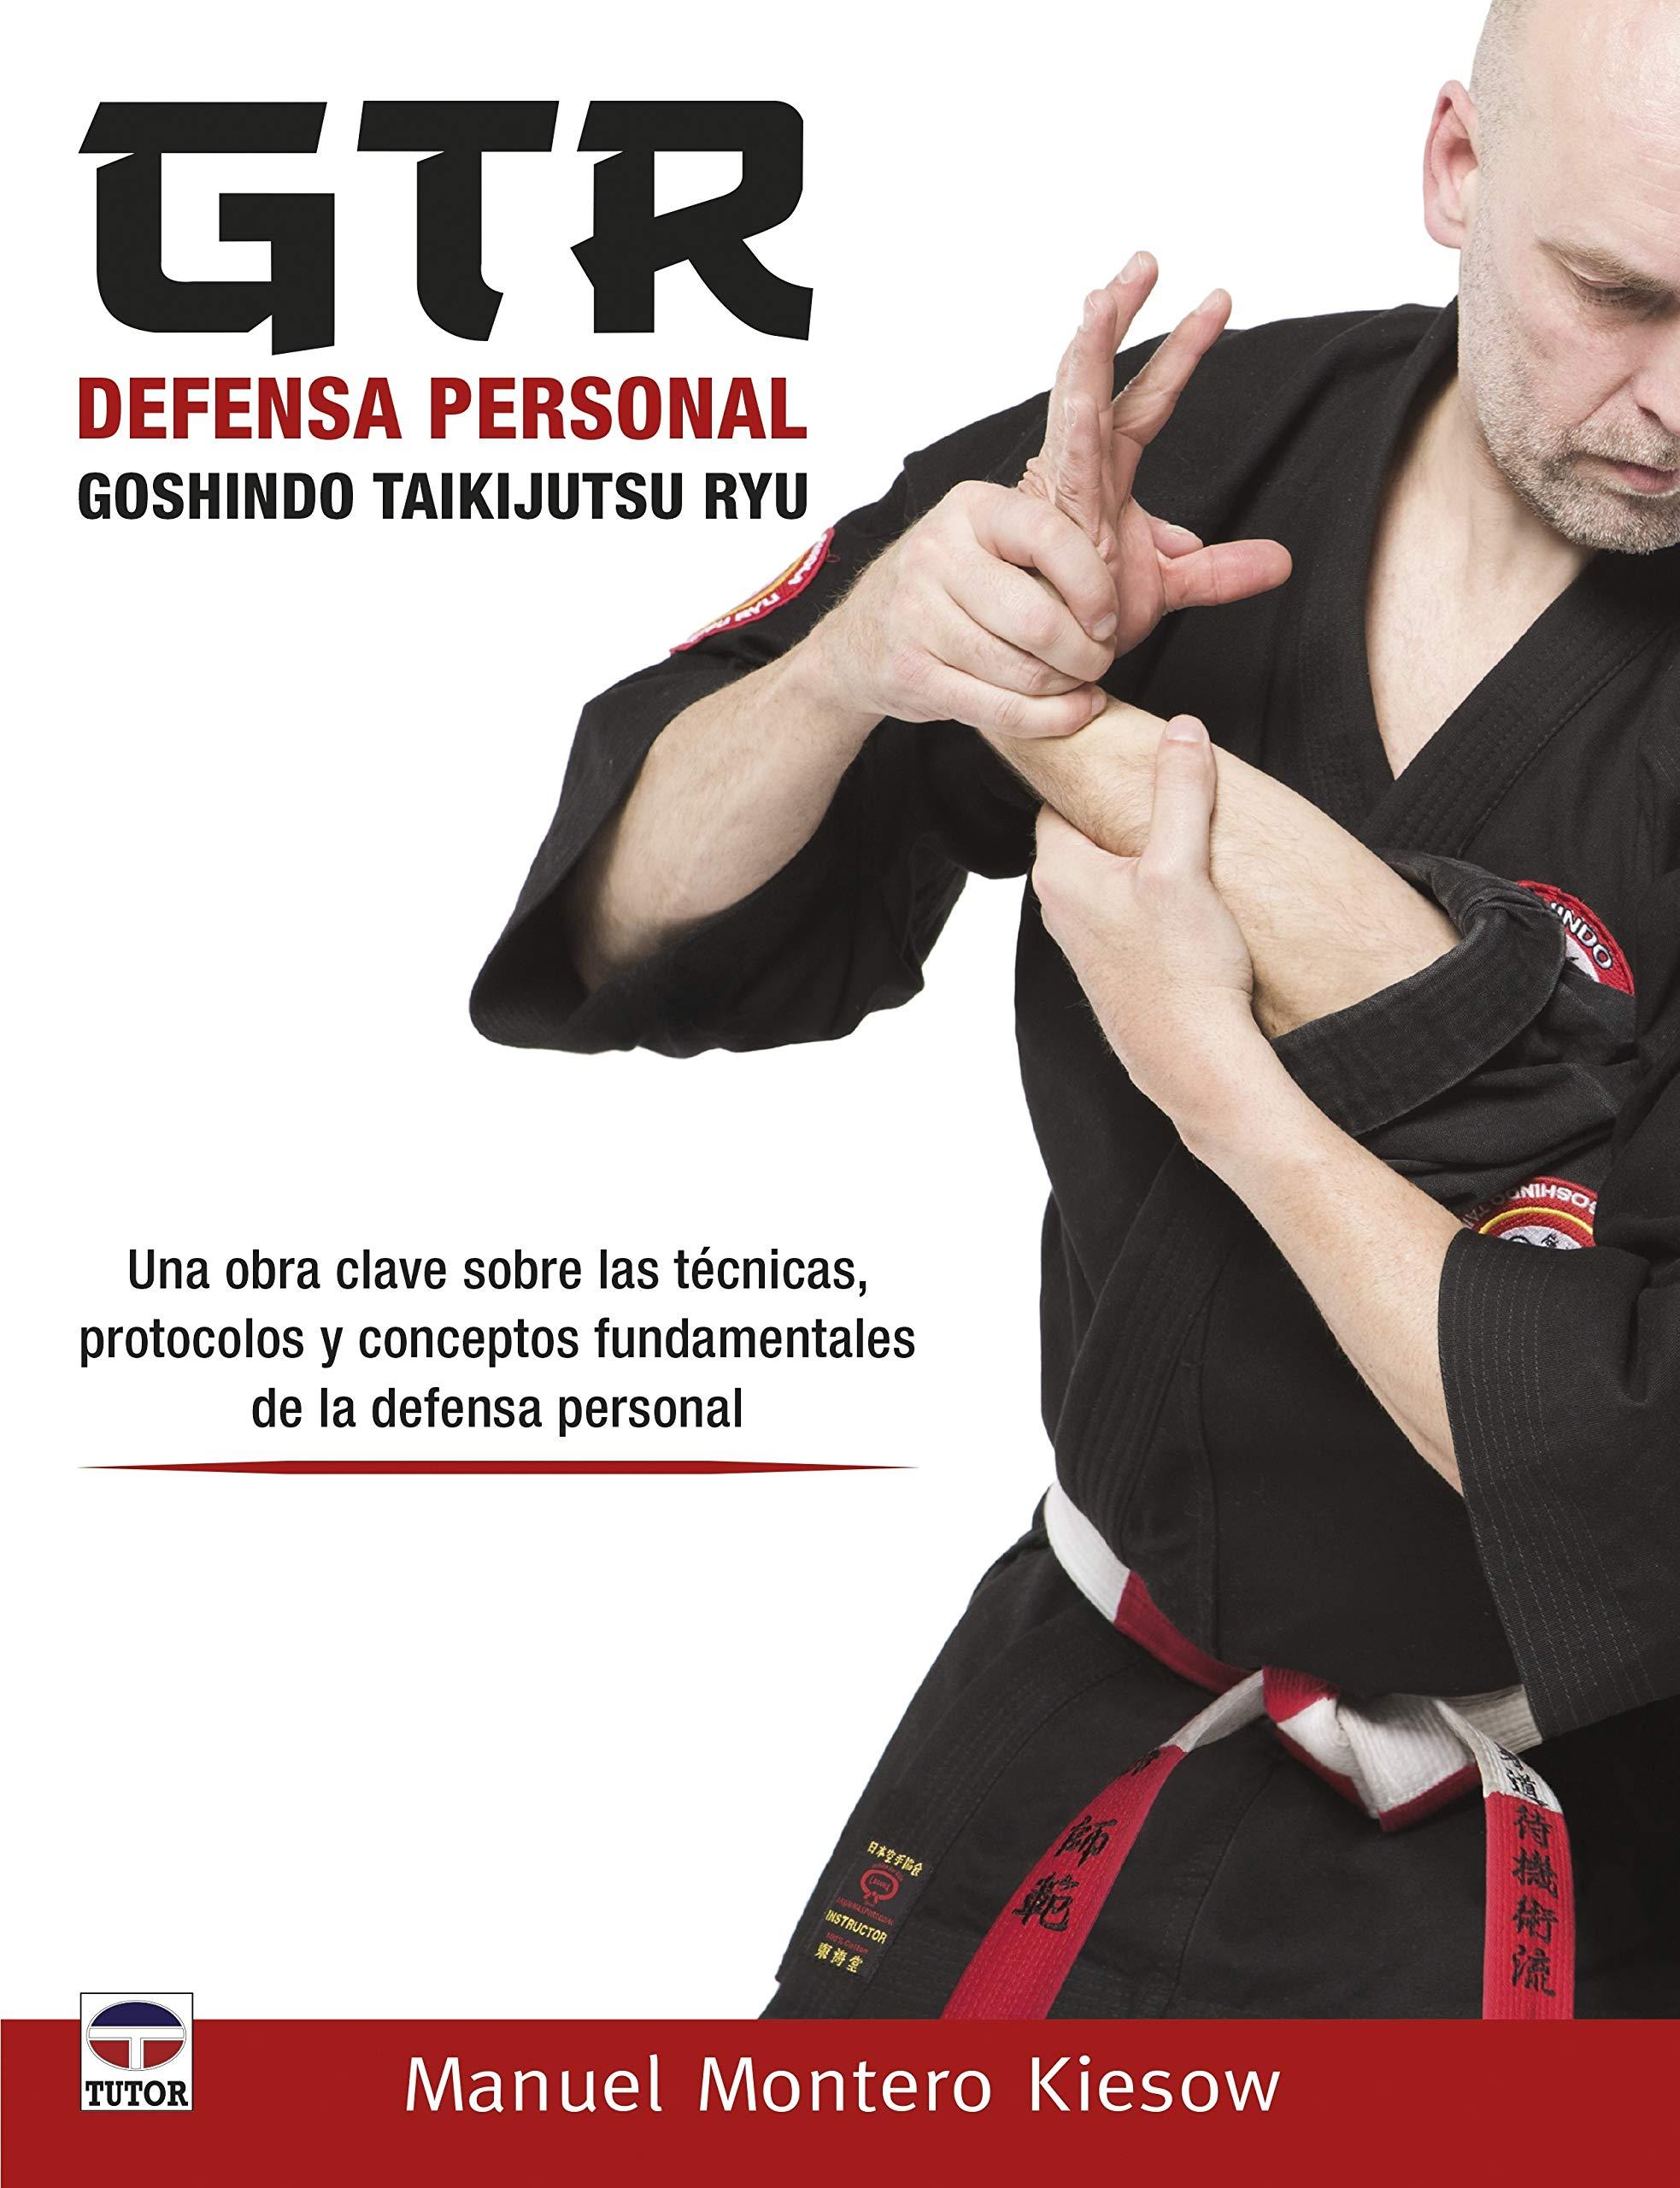 GTR Defensa personal Goshindo Taikijutsu Ryu: Amazon.es: Montero Kiesow, Manuel: Libros